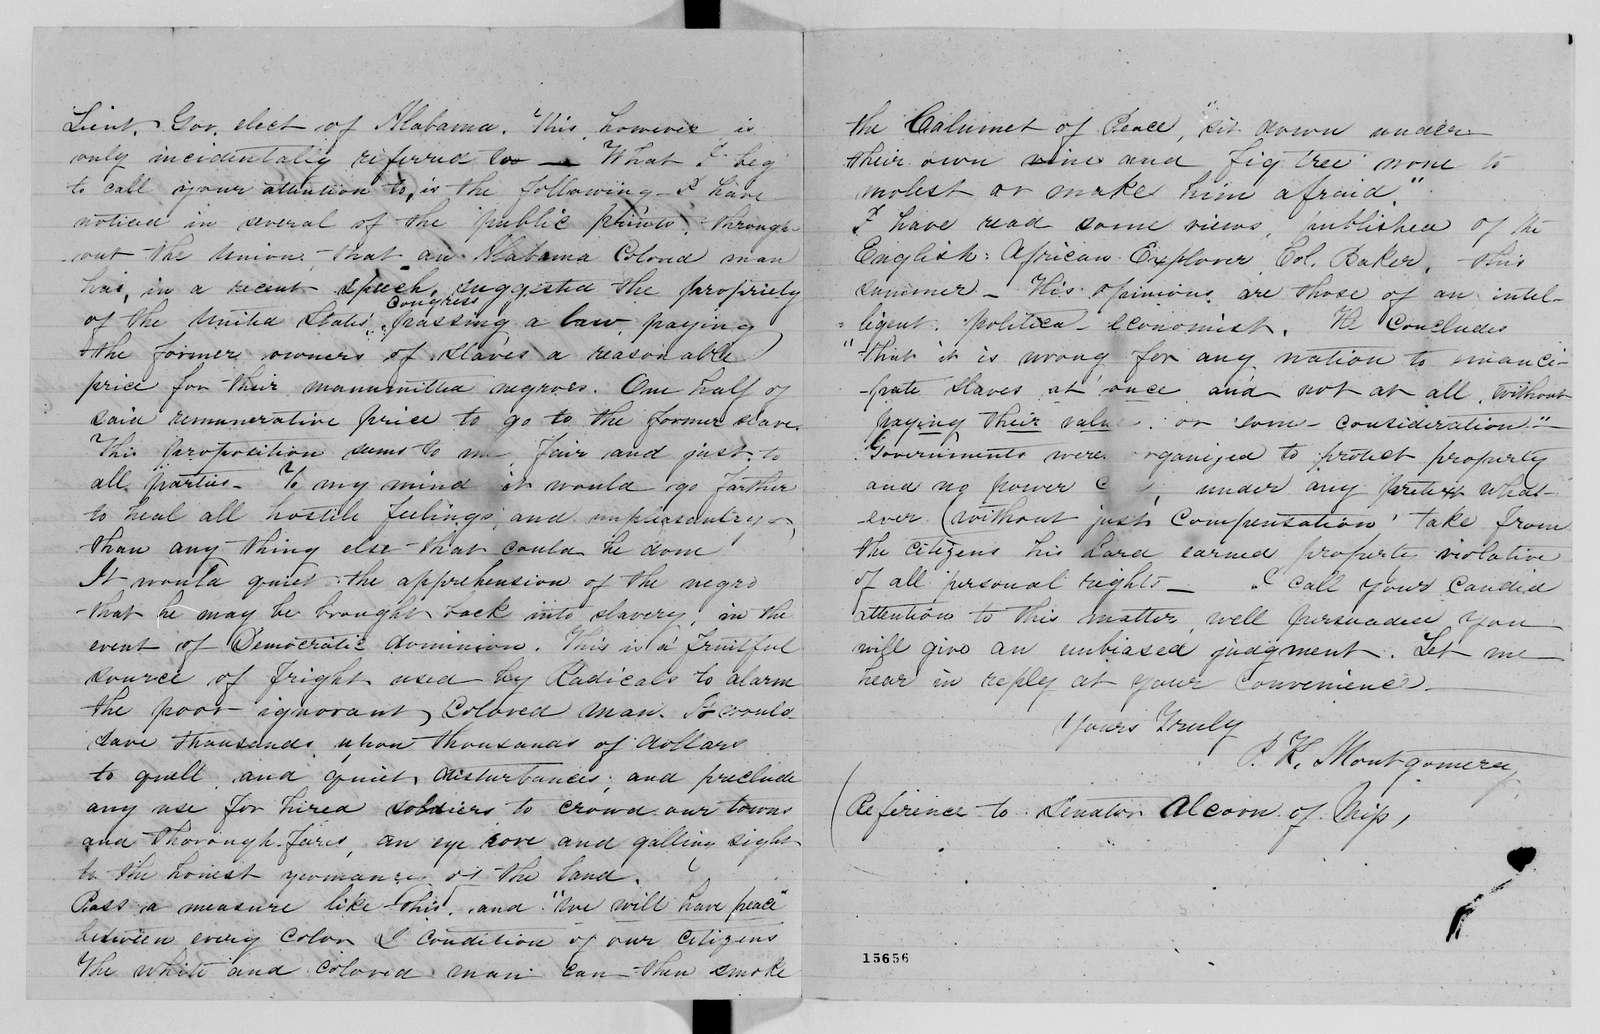 Alexander Hamilton Stephens Papers: General Correspondence, 1784-1886; 1874, Dec. 24-1875, Mar. 12